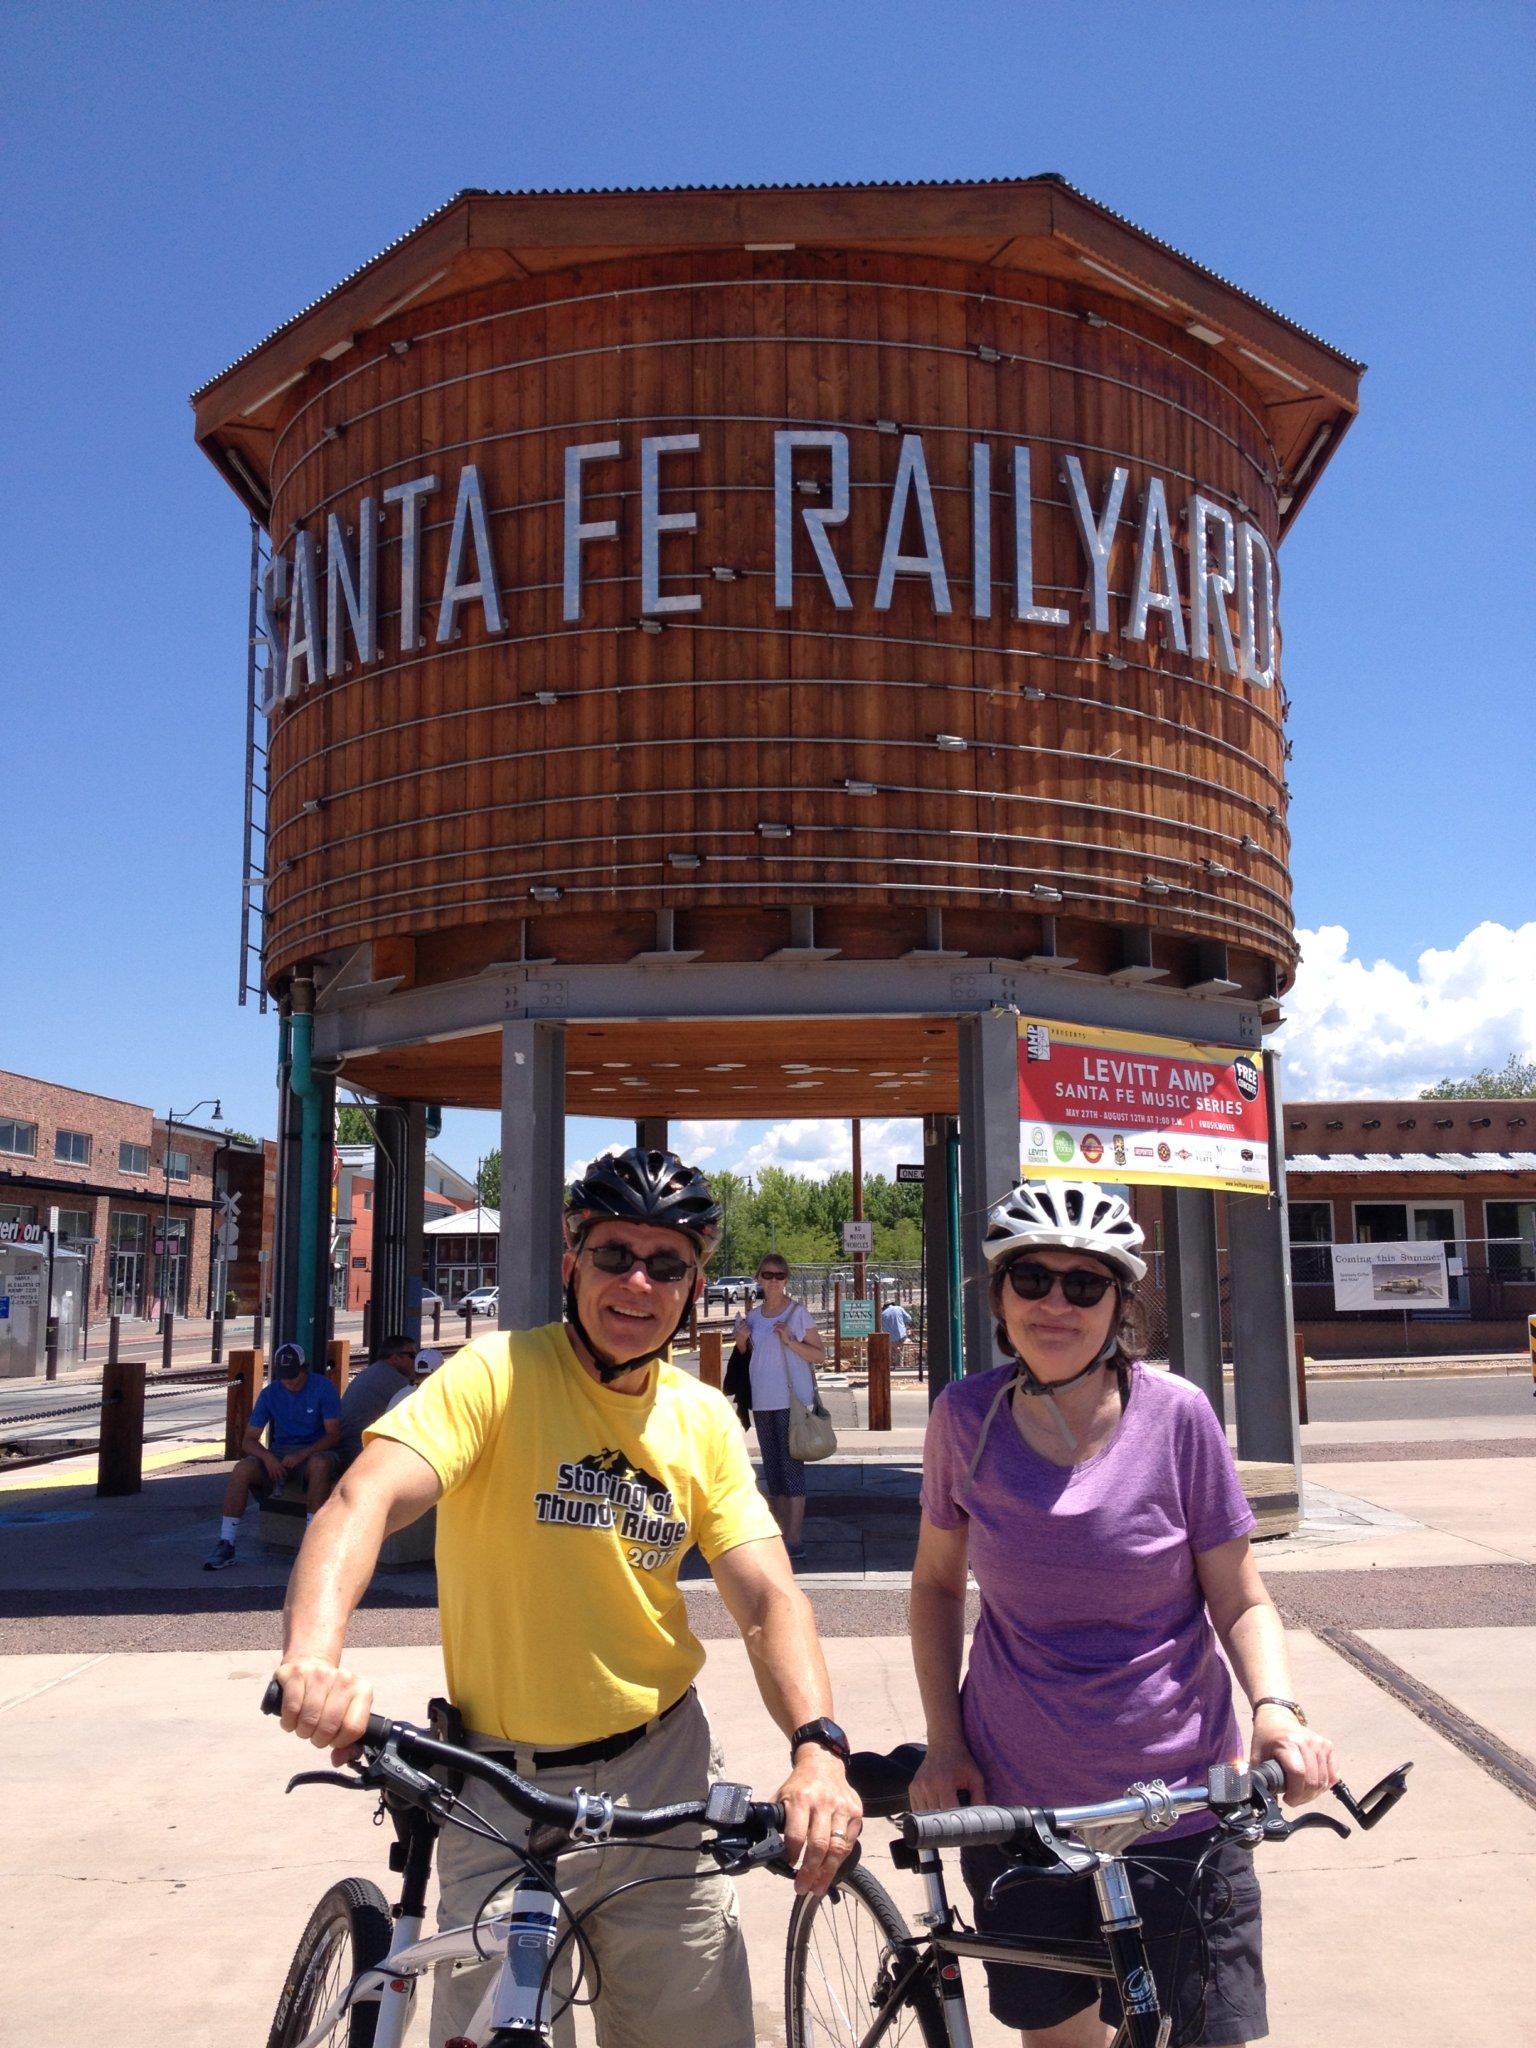 Santa Fe Biking Tours of Santa Fe, New Mexico